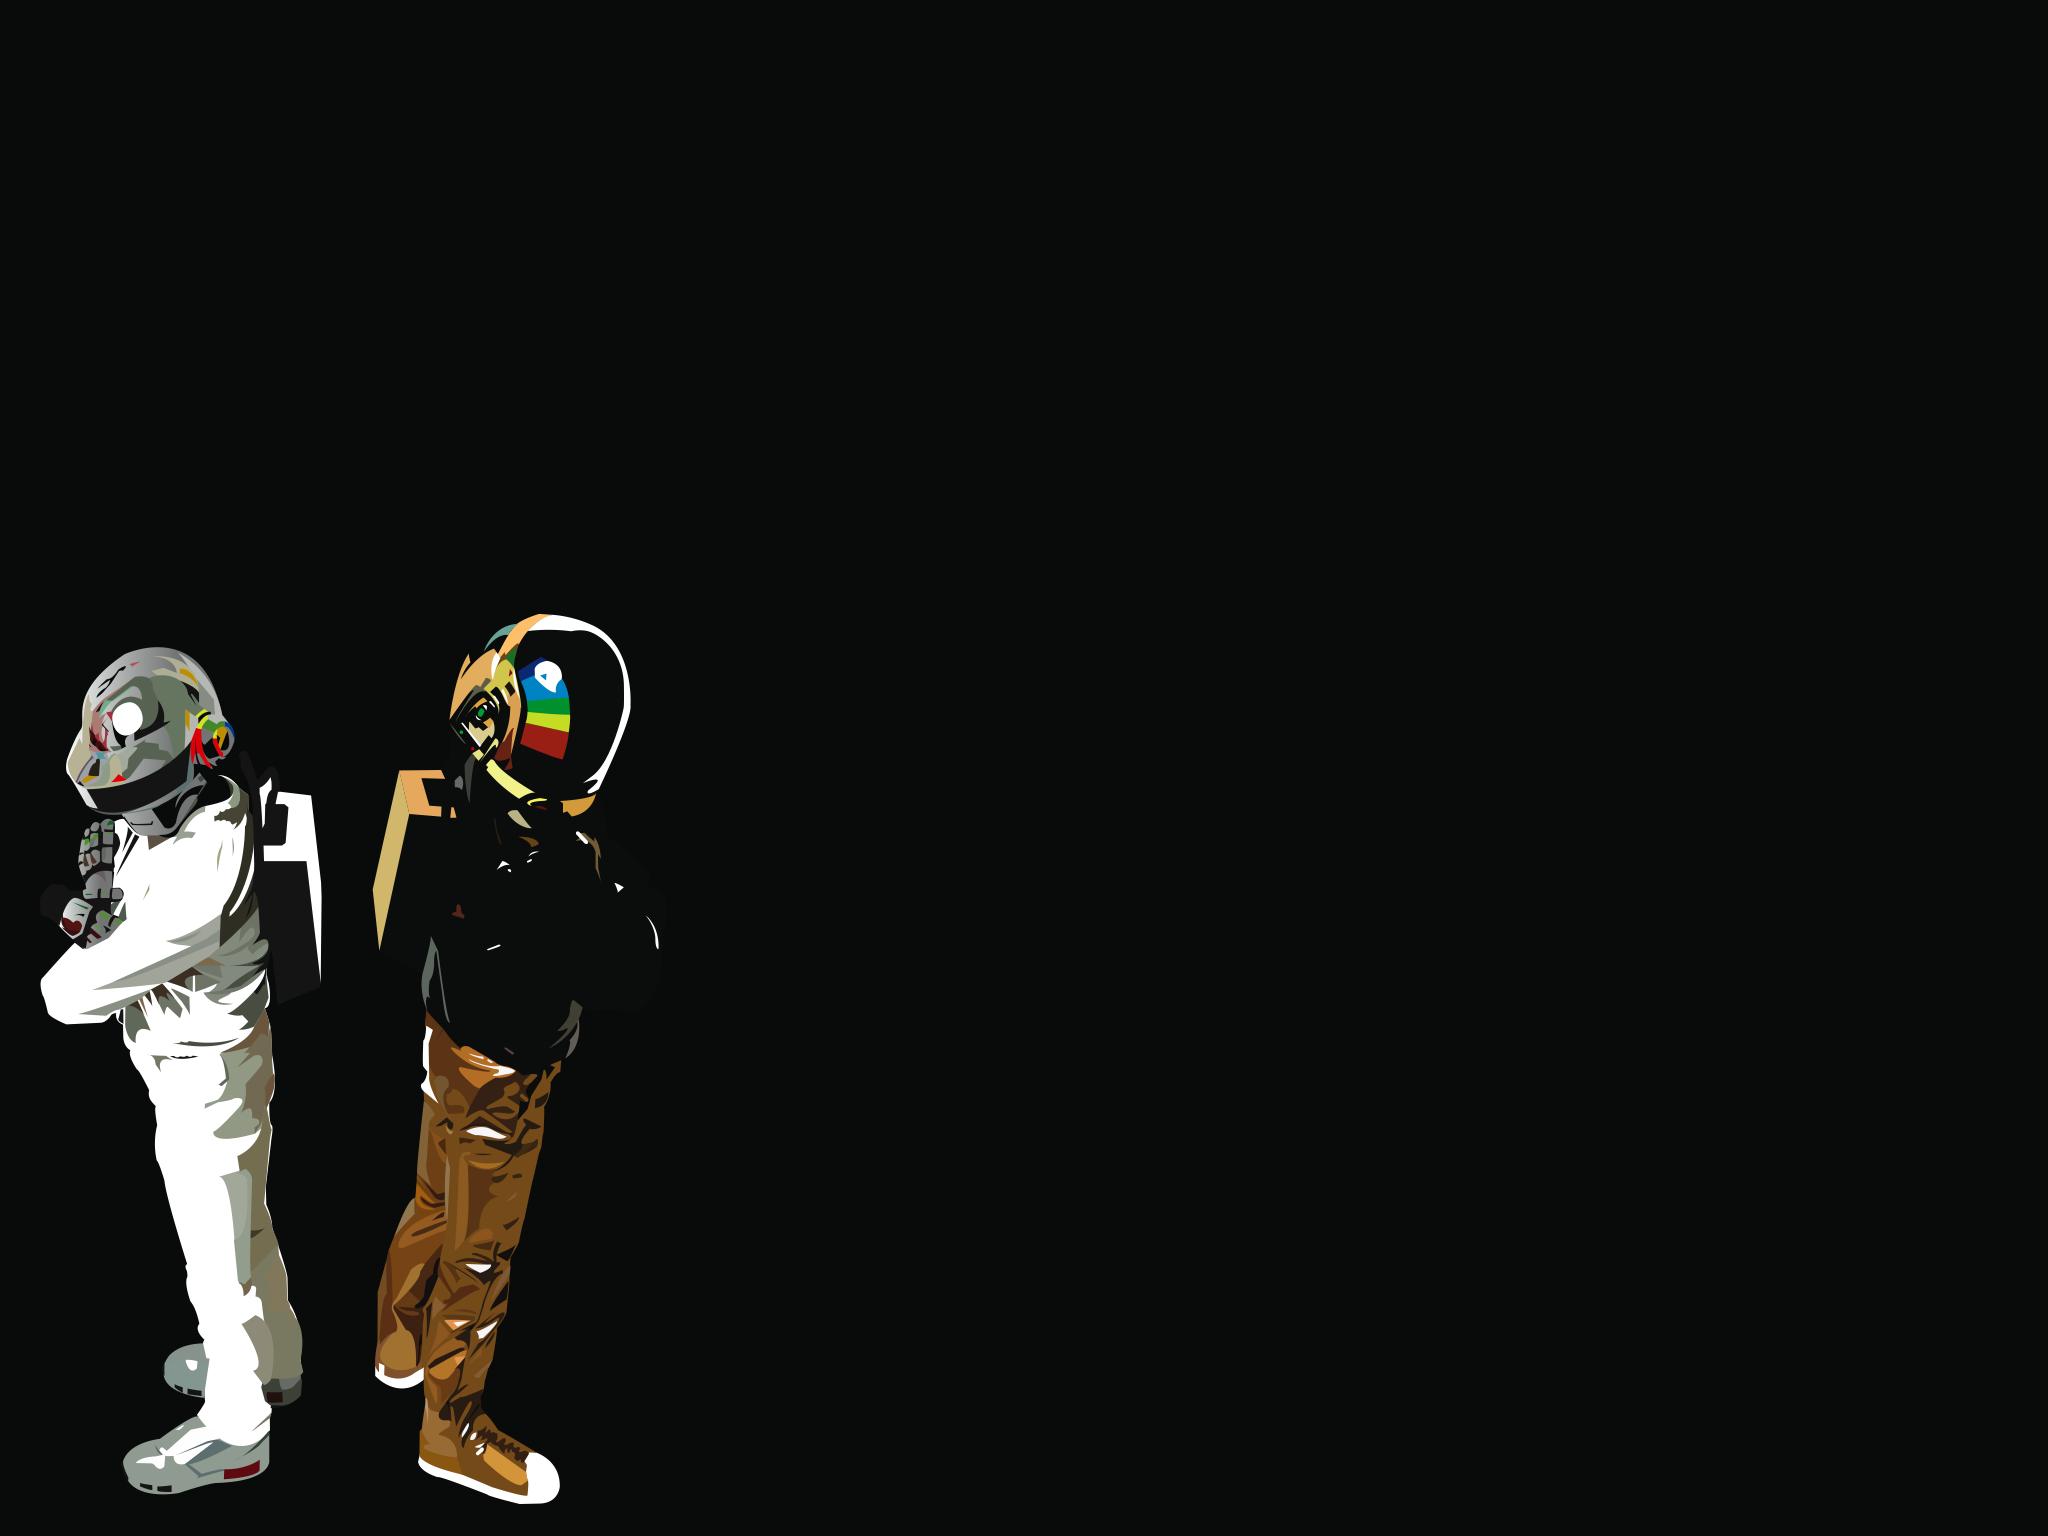 Daft Punk electronic music duo Guy-Manuel de Homem-Christo ...